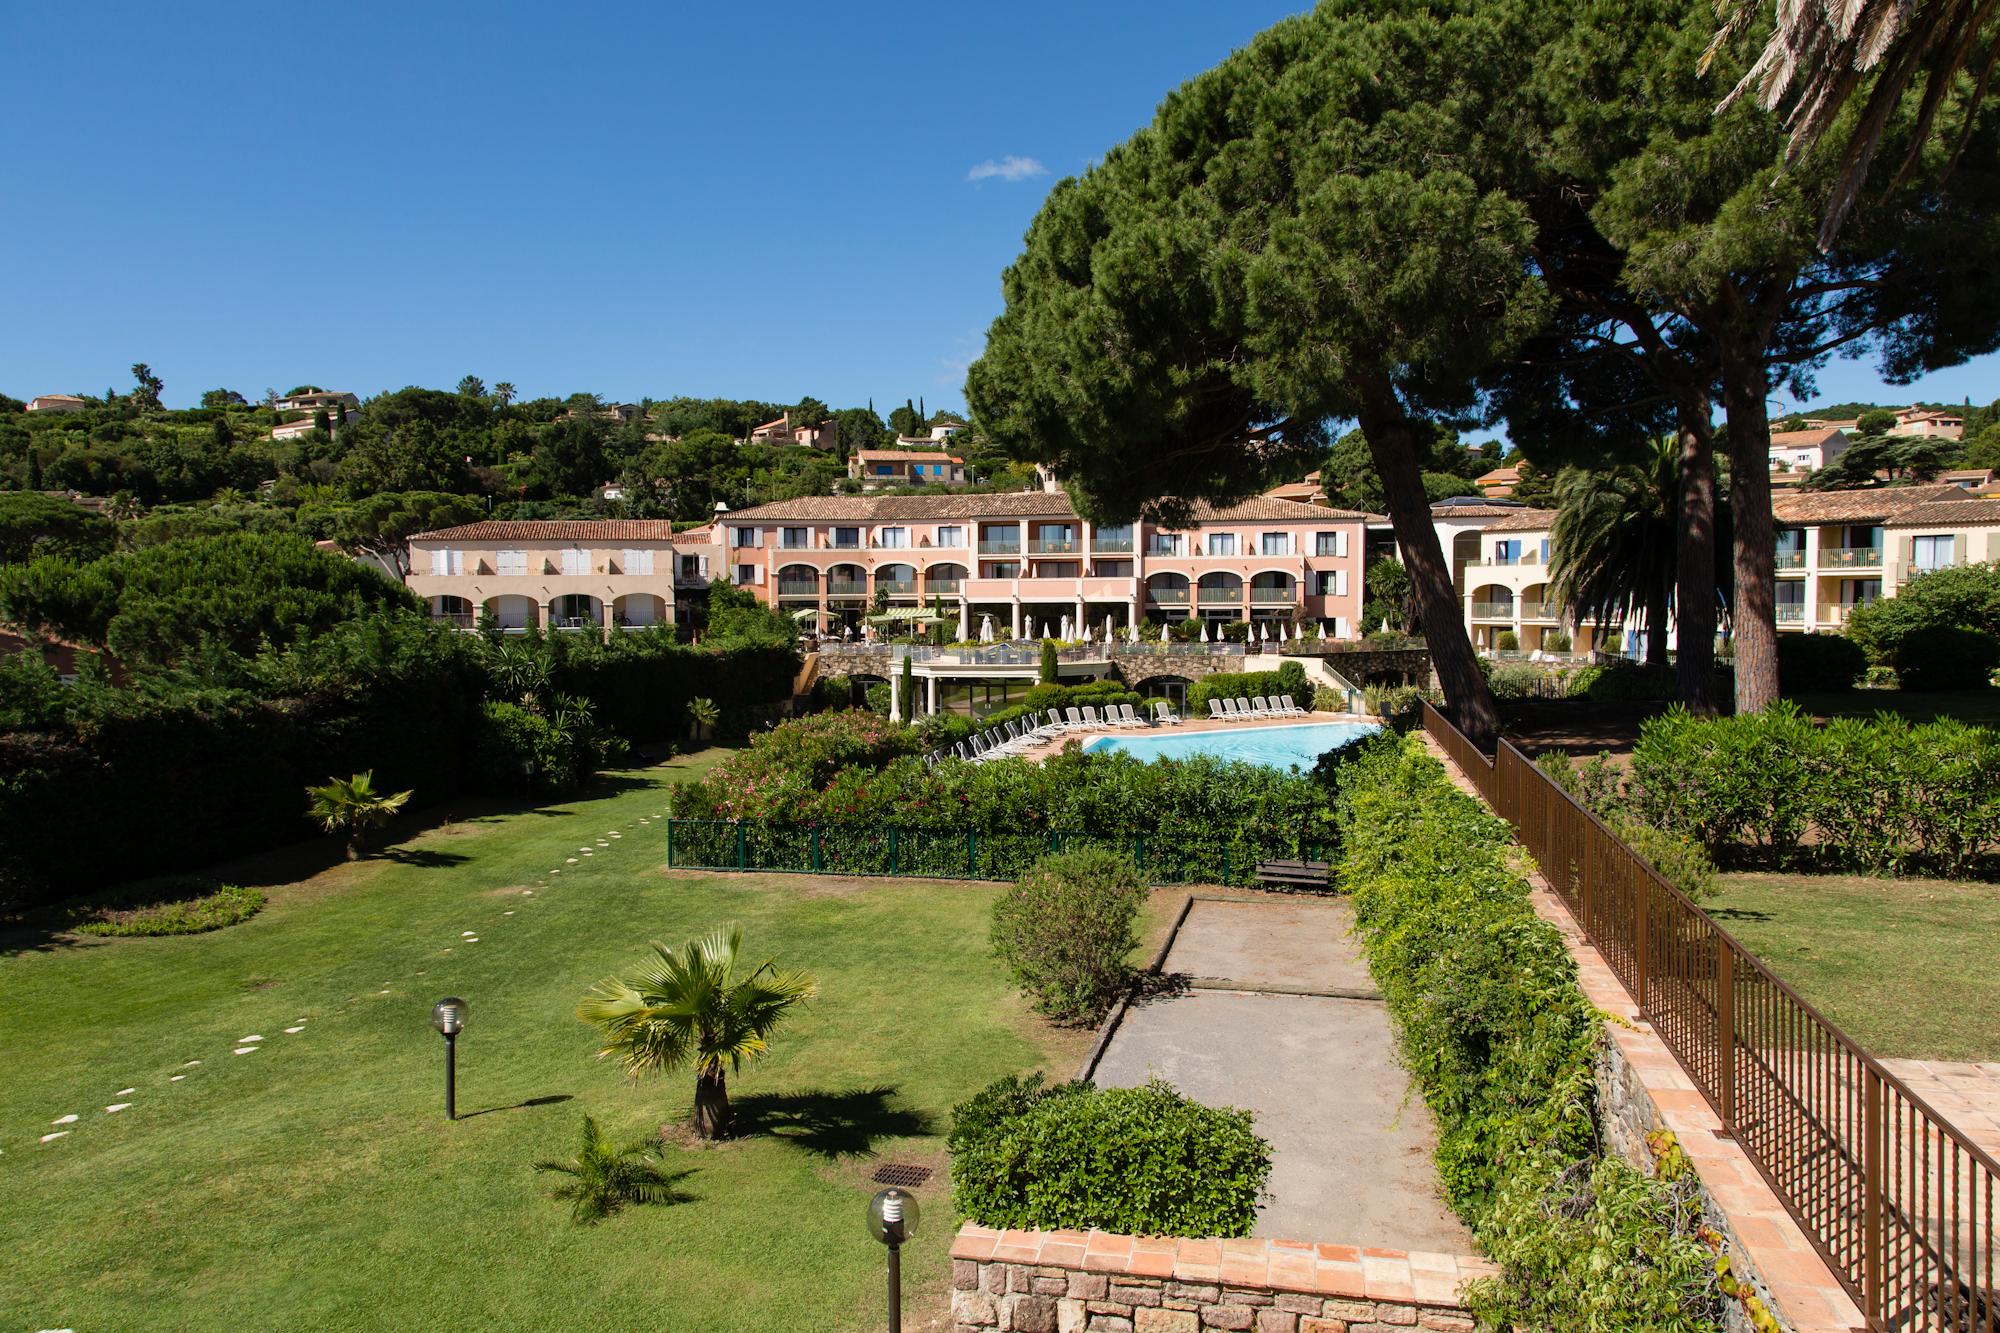 Trivago'dan Avrupa'daki En İyi 10 Aile Oteli ... concernant Hotel Les Jardins De Sainte Maxime